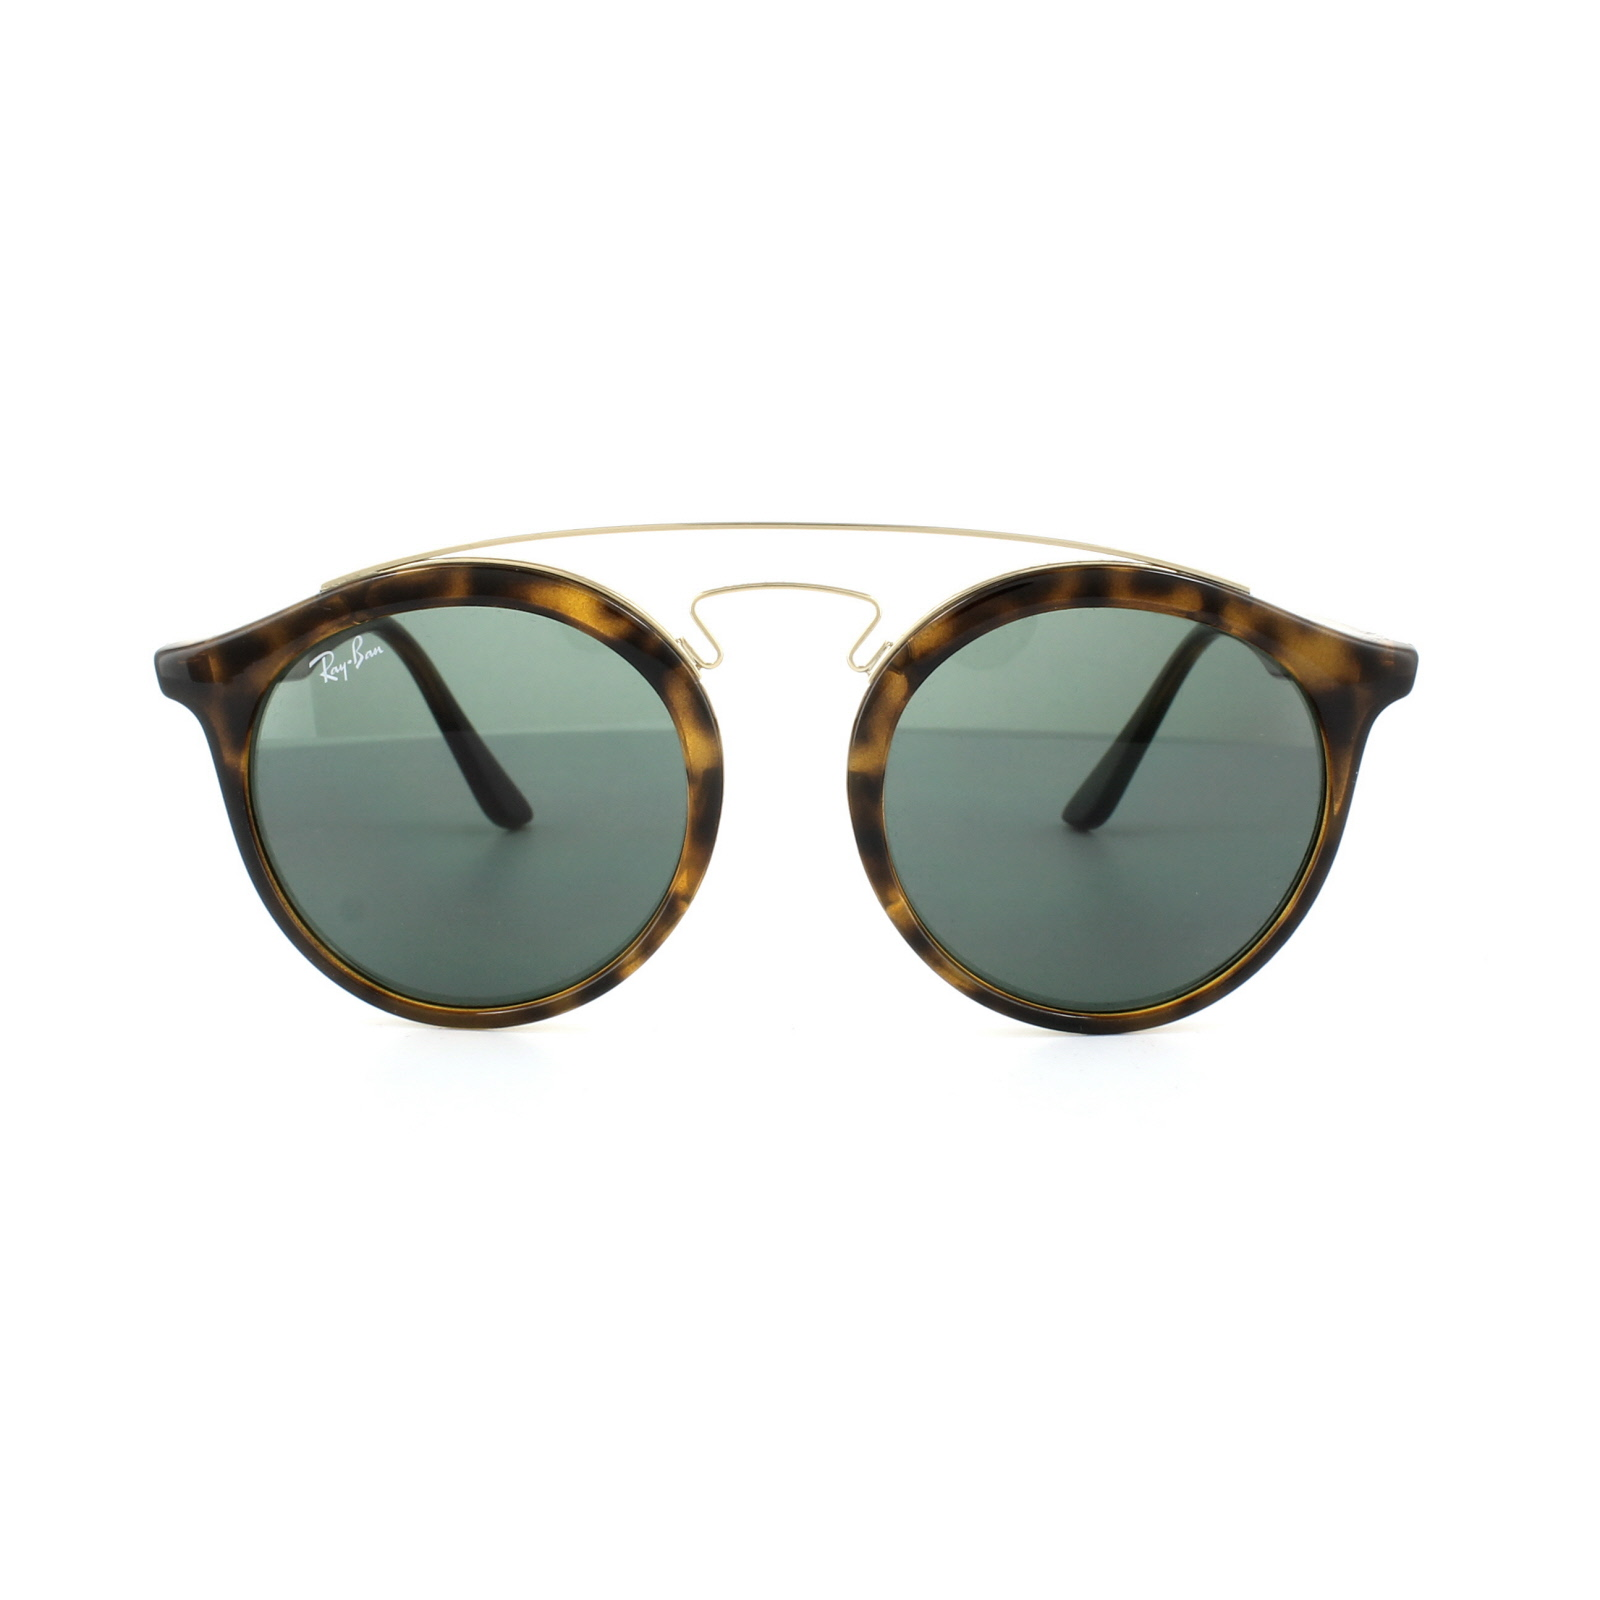 731ebffd6818b4 Sentinel Ray-Ban Sunglasses Gatsby 4256 609255 Matt Havana Blue Mirror  Large 49mm